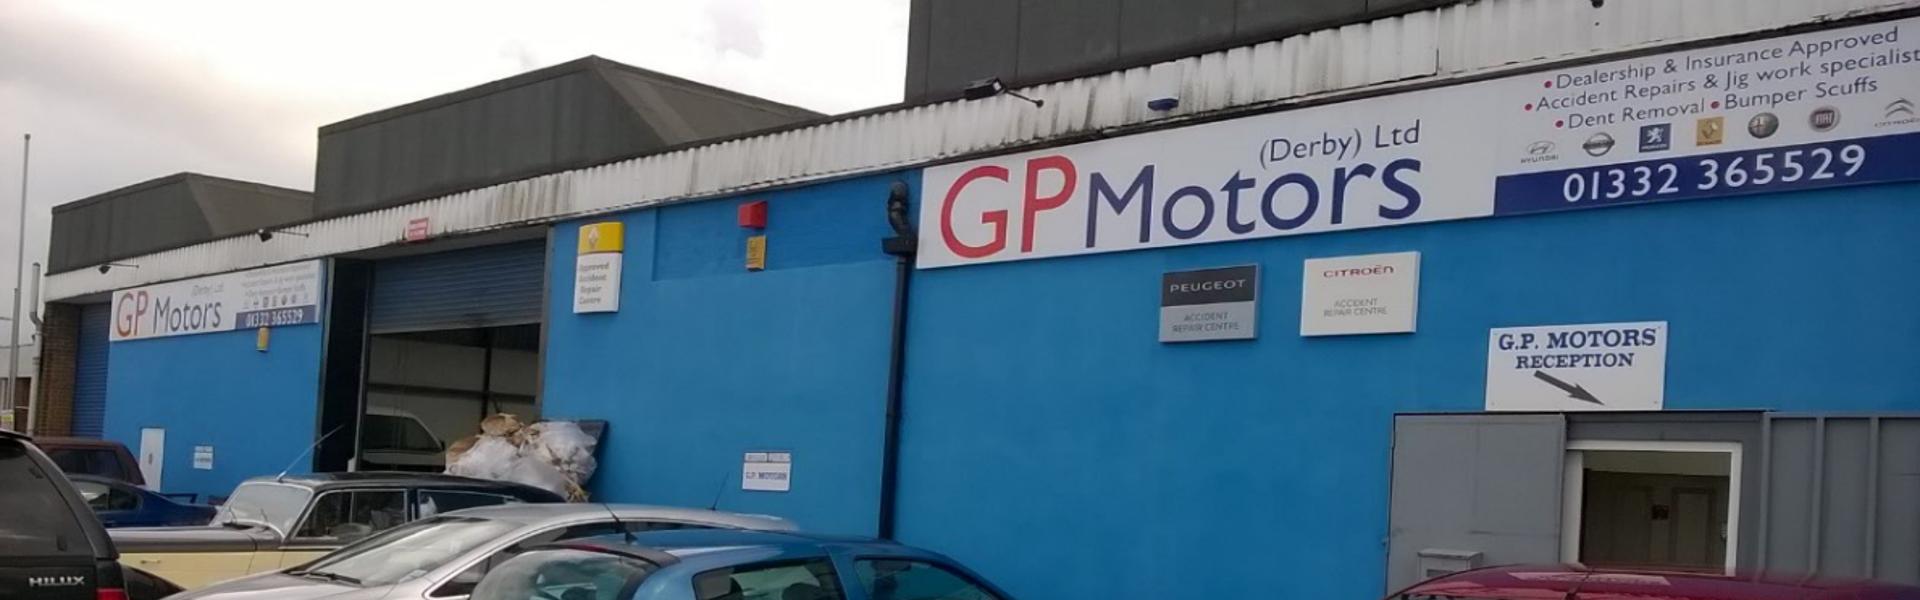 GP motors logo